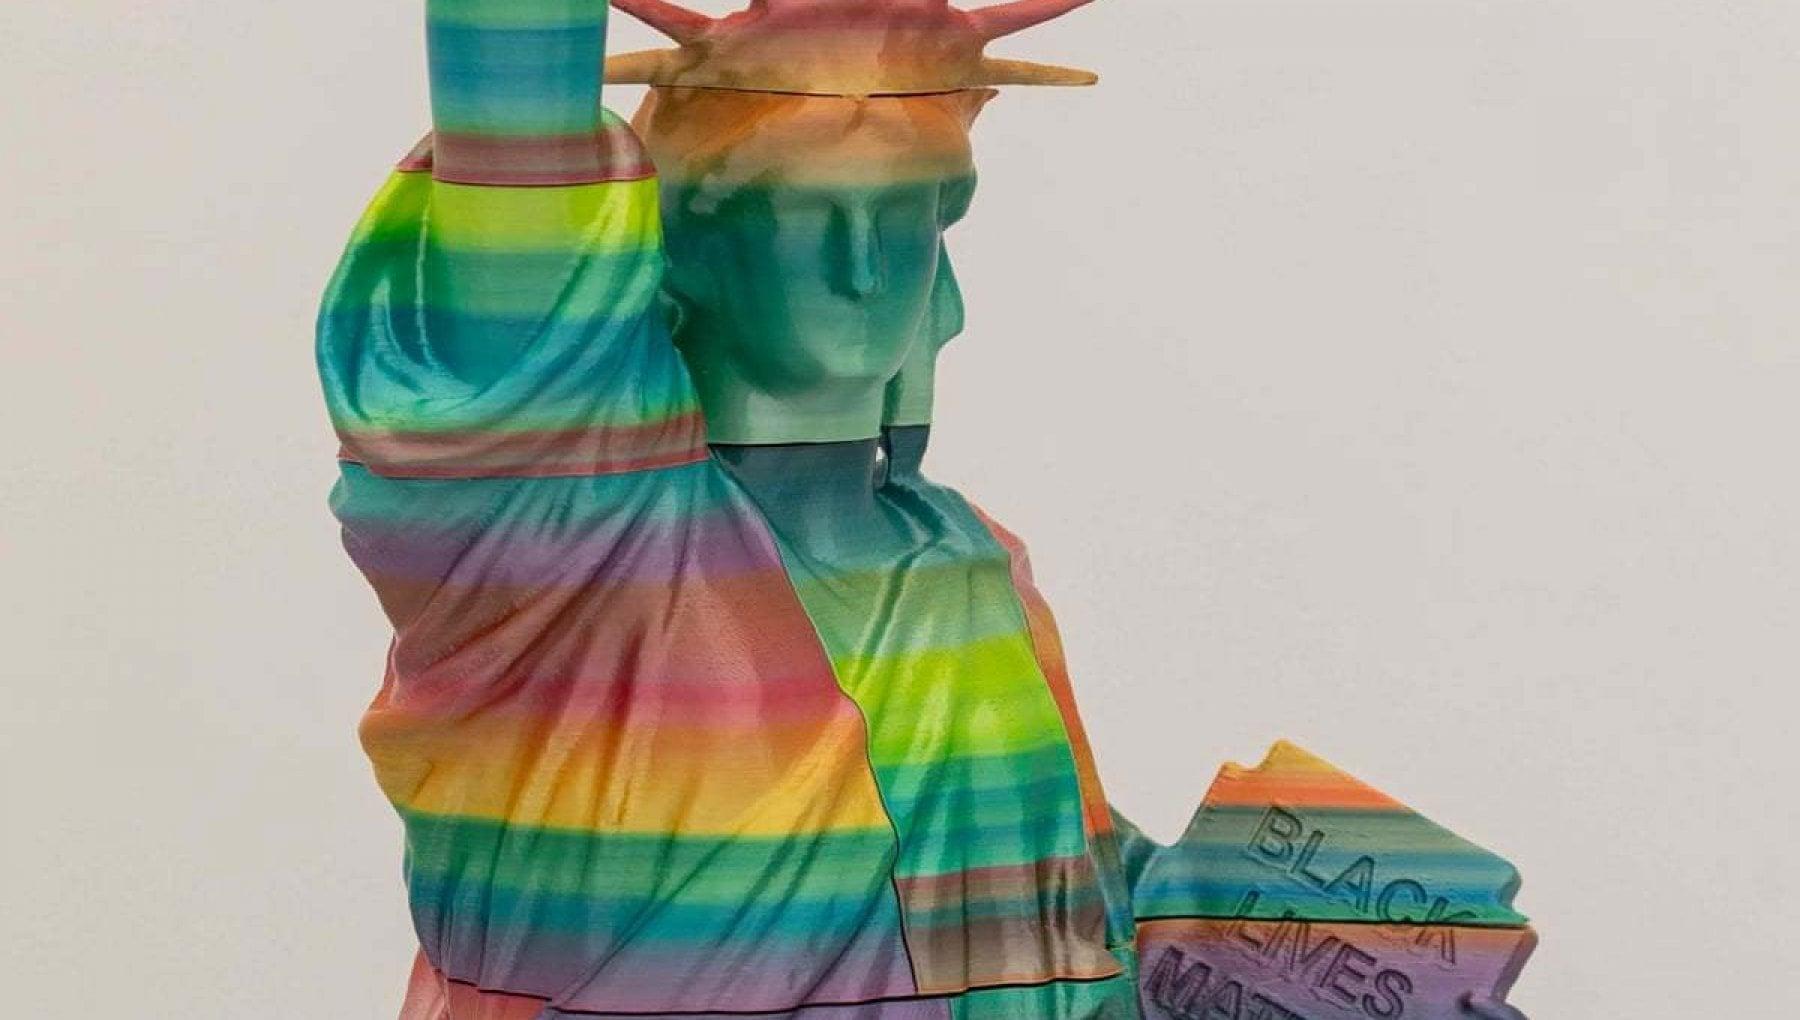 "115855348 5be0d90e 2cc8 4d85 960a b01de9ba4378 - Ungheria, il governo contro la scultura dedicata a Black Lives Matter: ""Movimento razzista"""